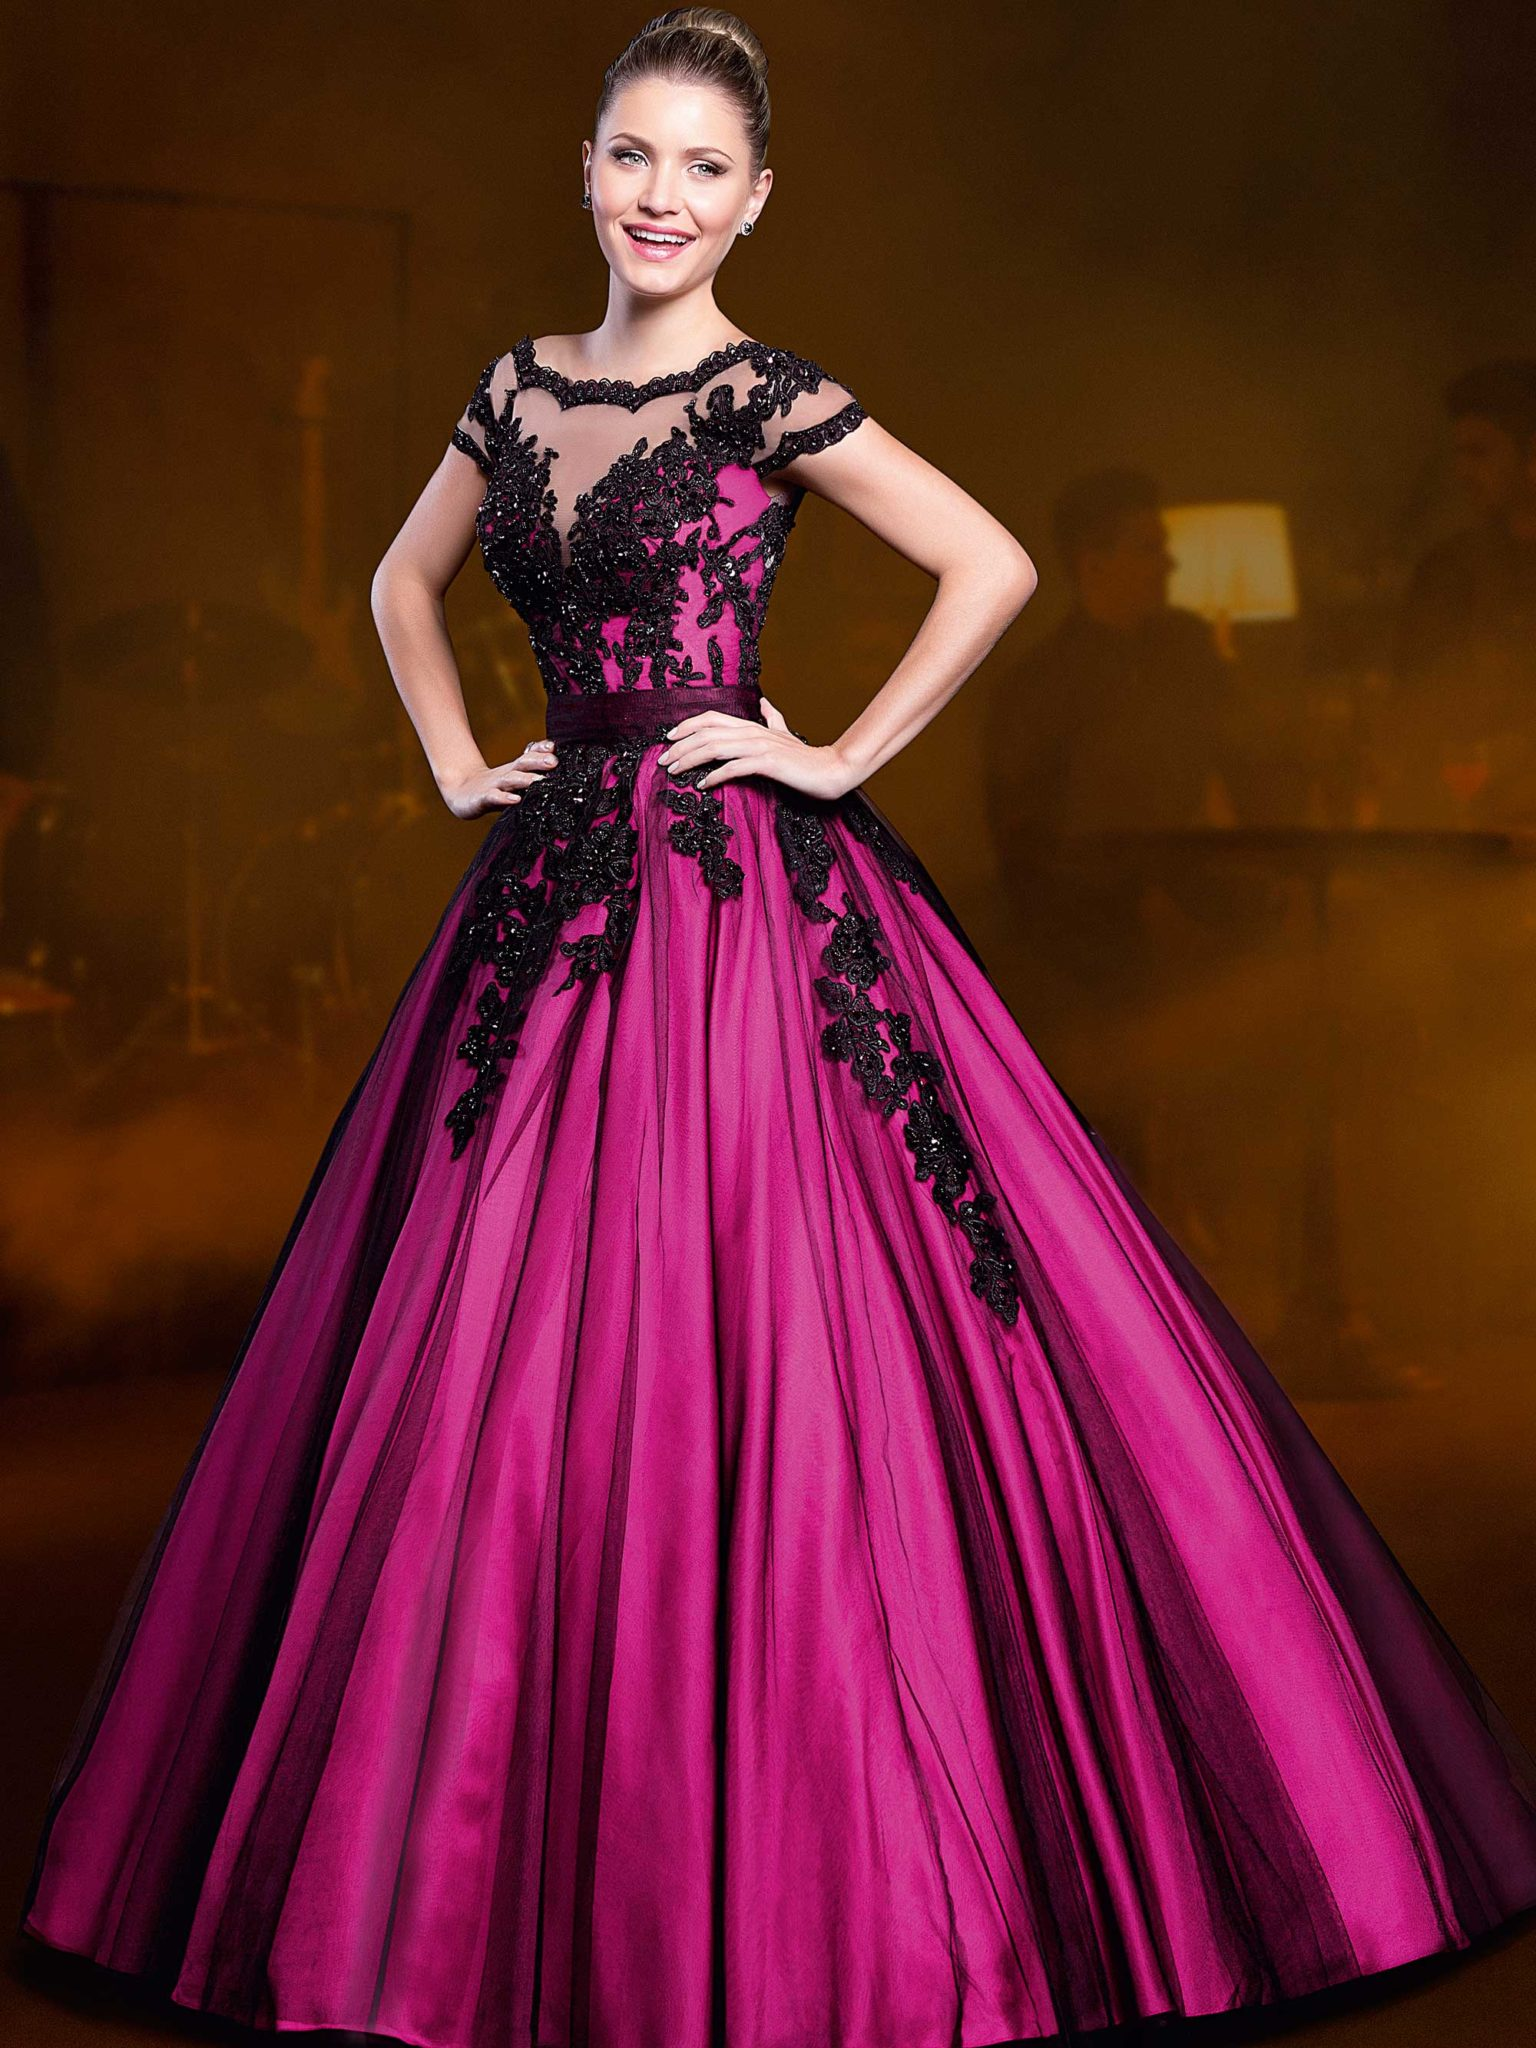 Vestidos de festa15 ANOS modelos maravilhosos